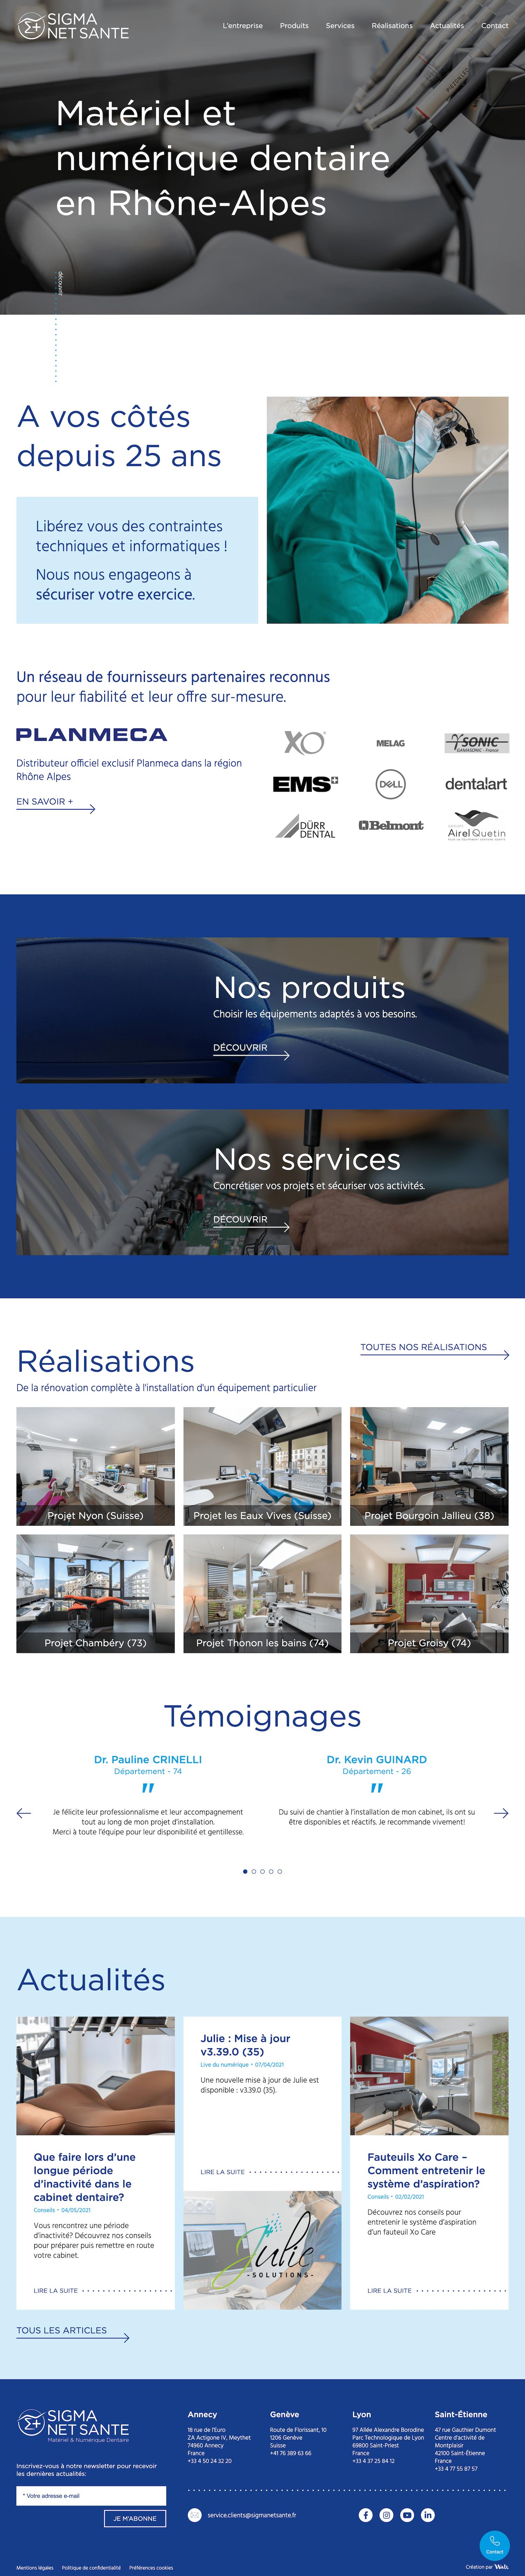 Webdesign page d'accueil site web Wordpress